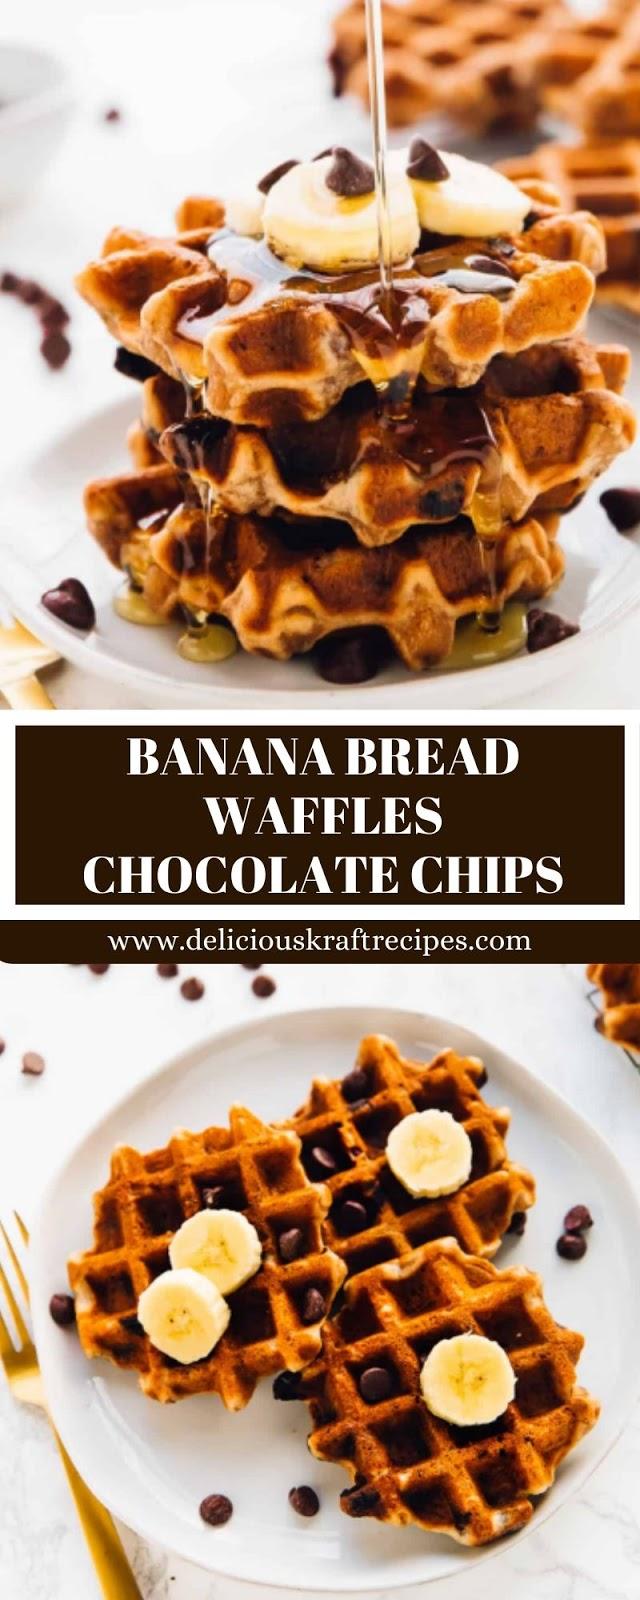 BANANA BREAD WAFFLES CHOCOLATE CHIPS